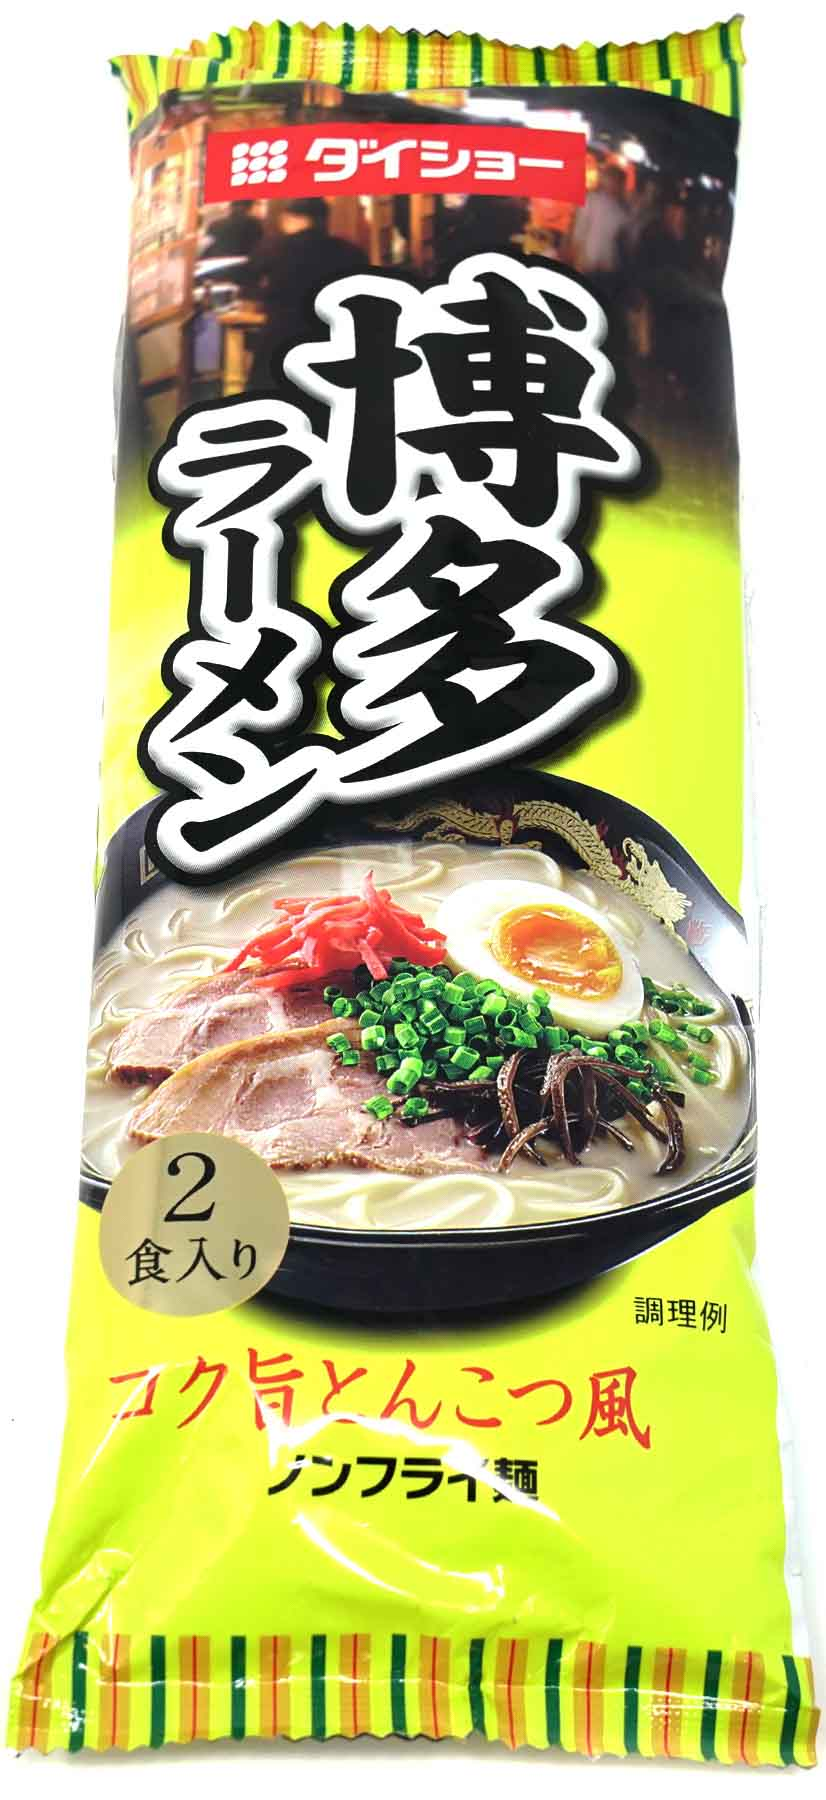 DAISHO Hakata Ramen, 188 g